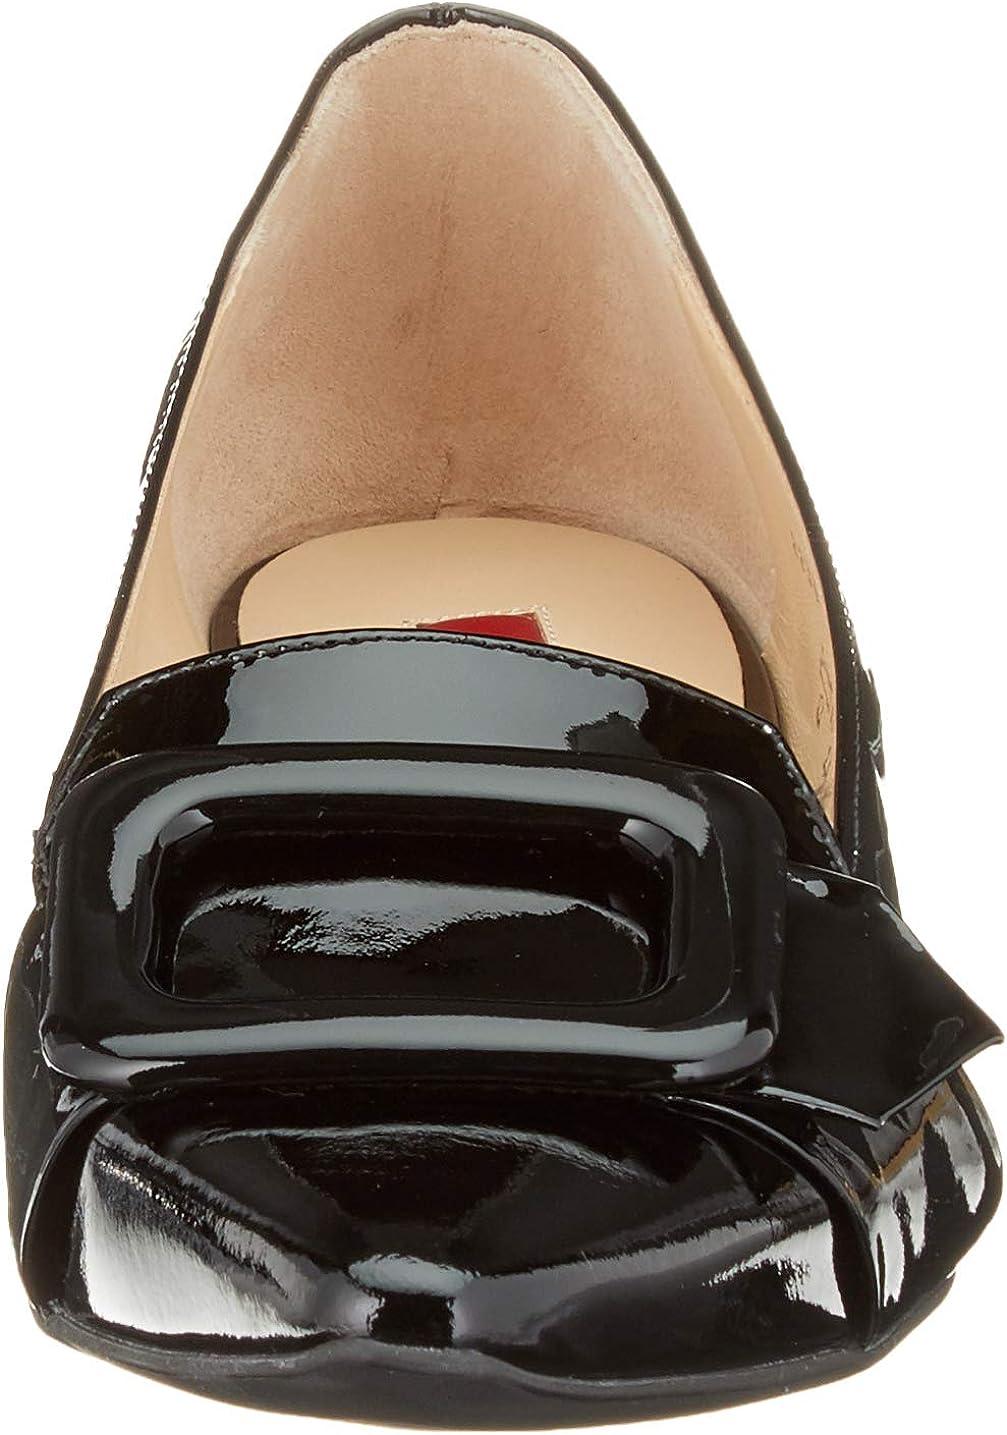 H/ÖGL Womens Essential Closed Toe Ballet Flats